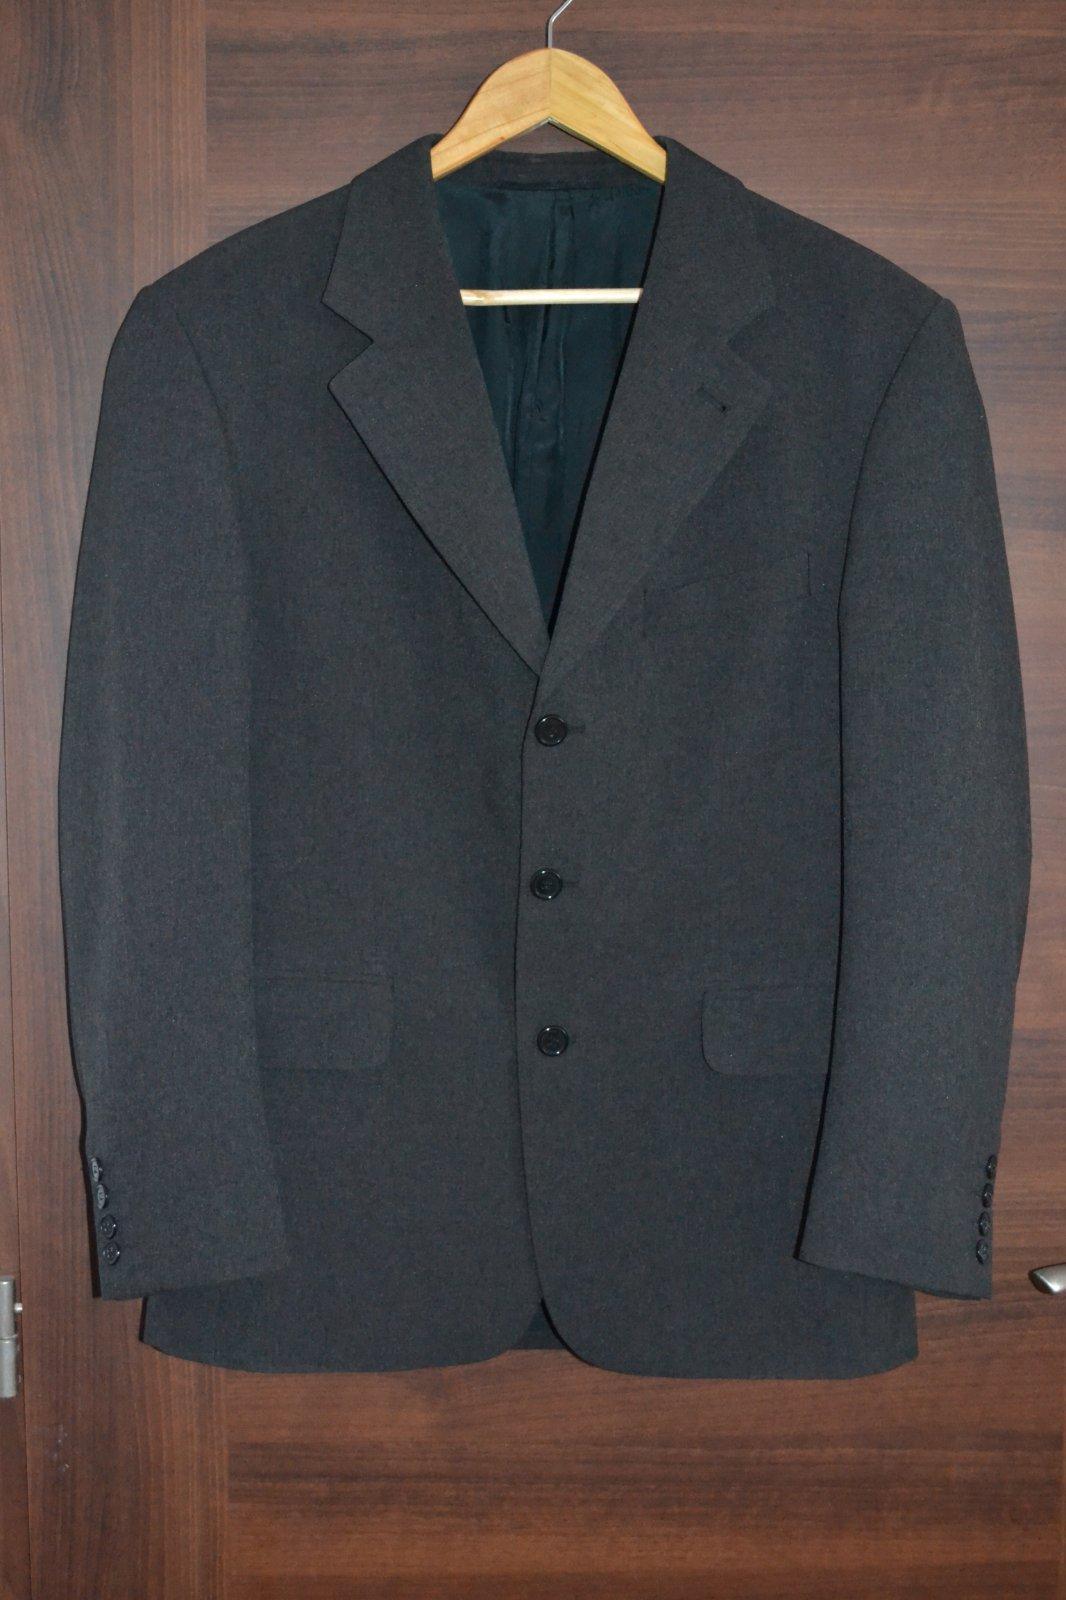 c4dfd9545a Pansky oblek c. 48